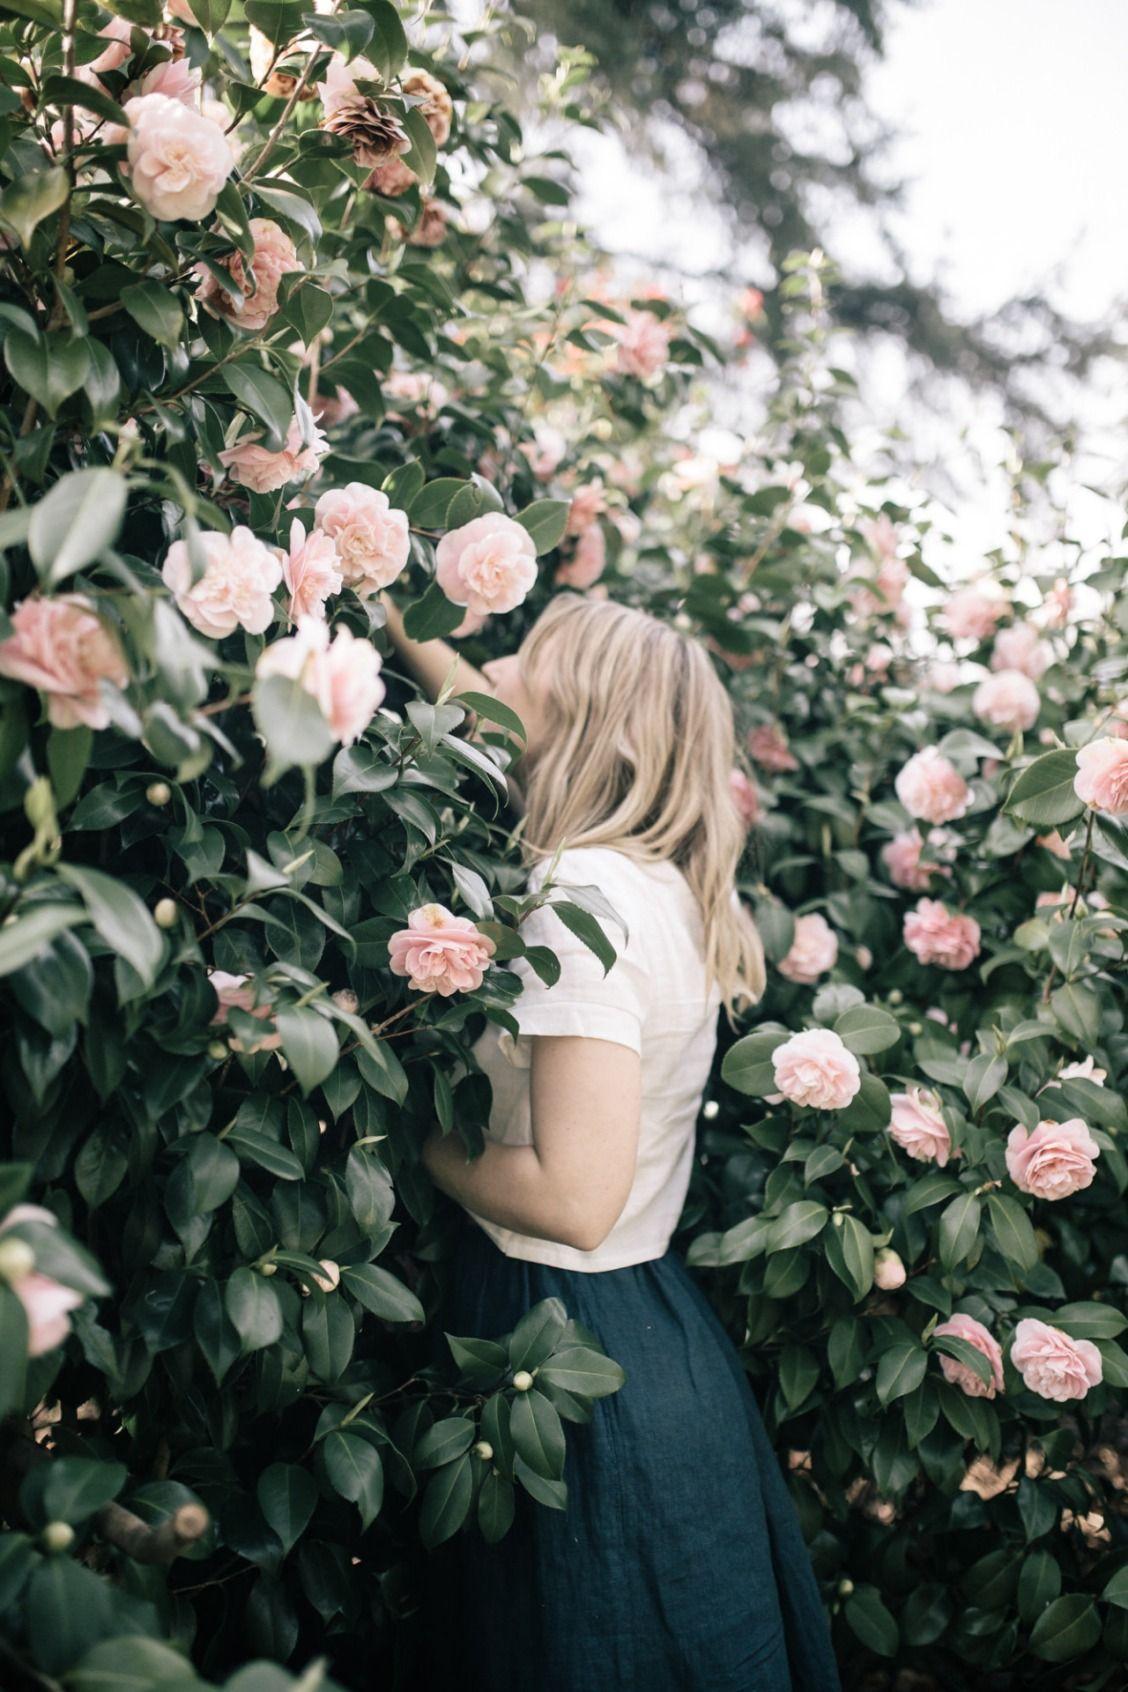 Image Via Simply Aesthetic Spring aesthetic